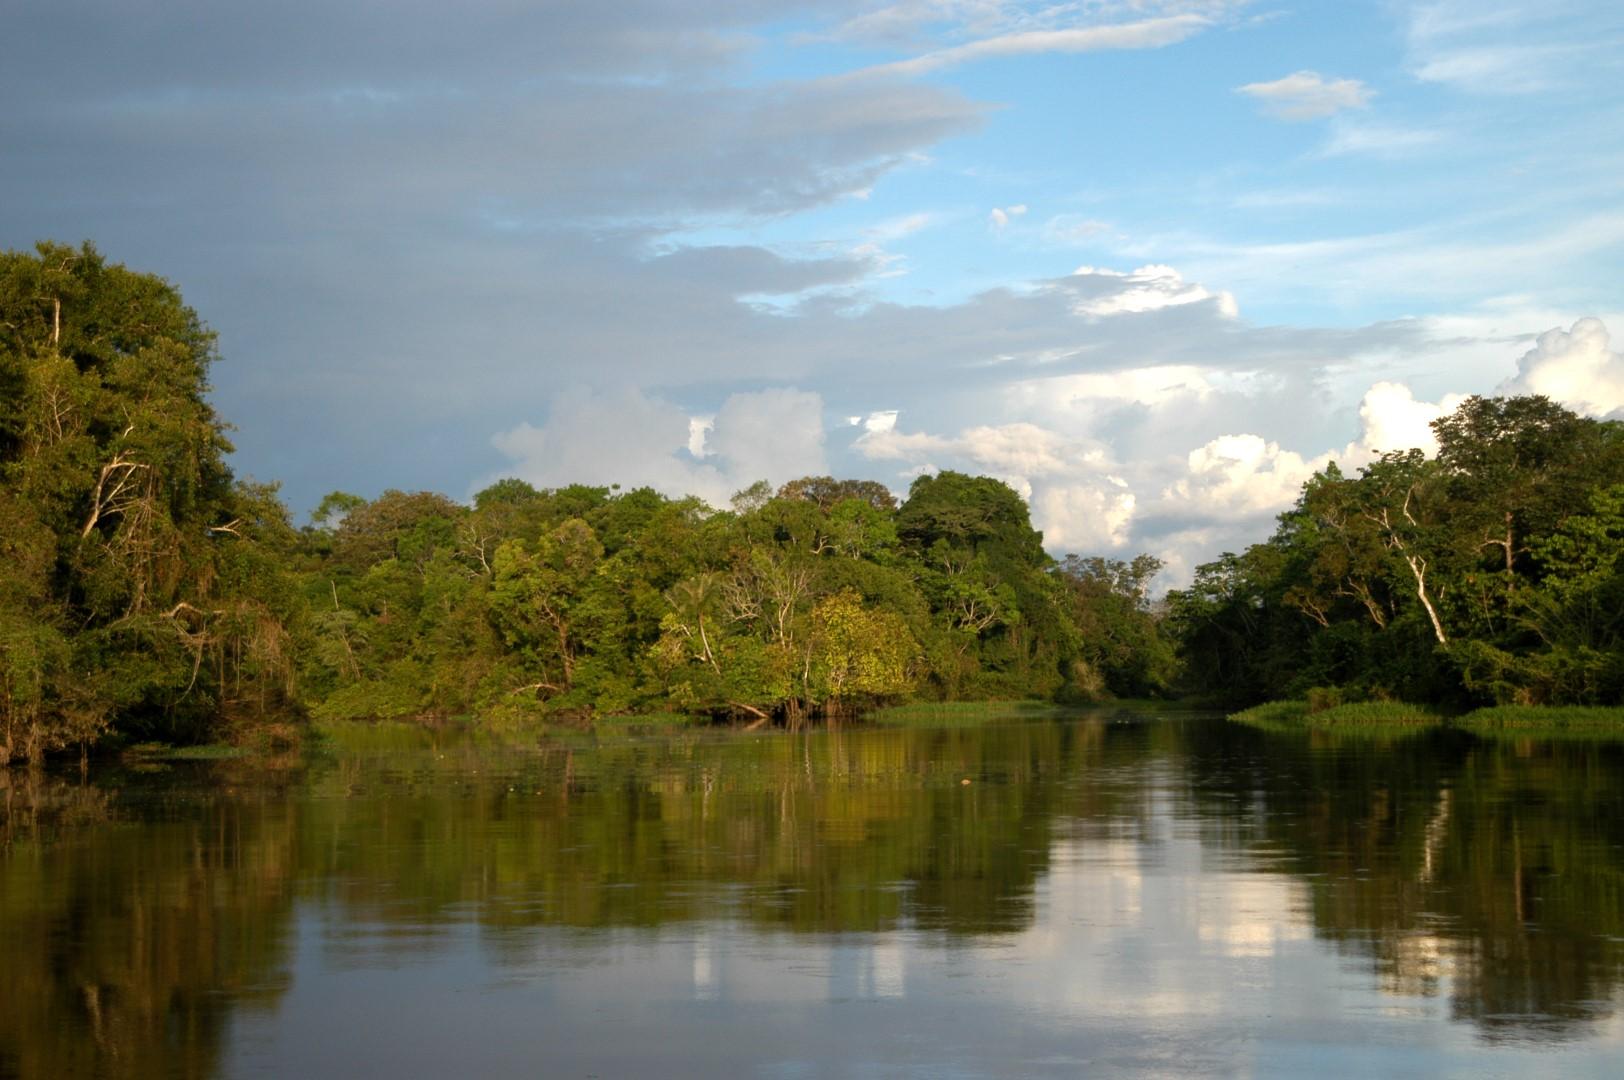 Amazon River   Trips Amazon River   Amazon Lodge Iquitos   Amazon River Tour   Amazon River Cruises   Rainforest Adventure   Canopy Walkway ...